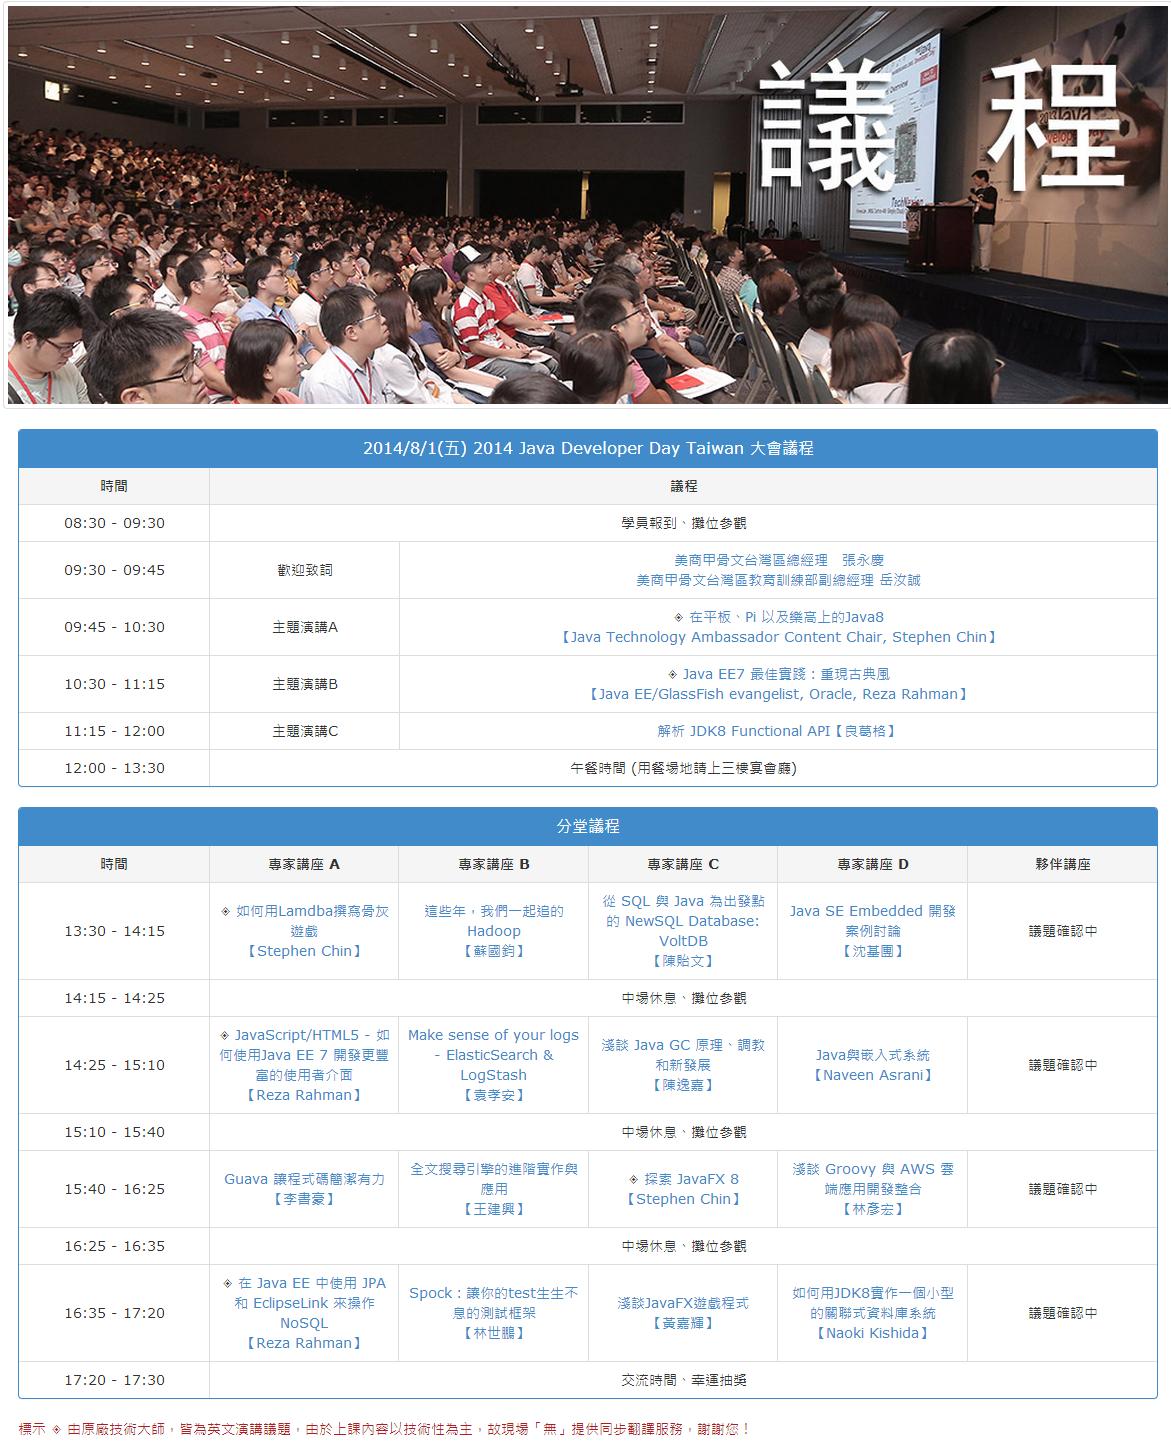 http://www.codedata.com.tw/event/javaday/2014/agenda.html